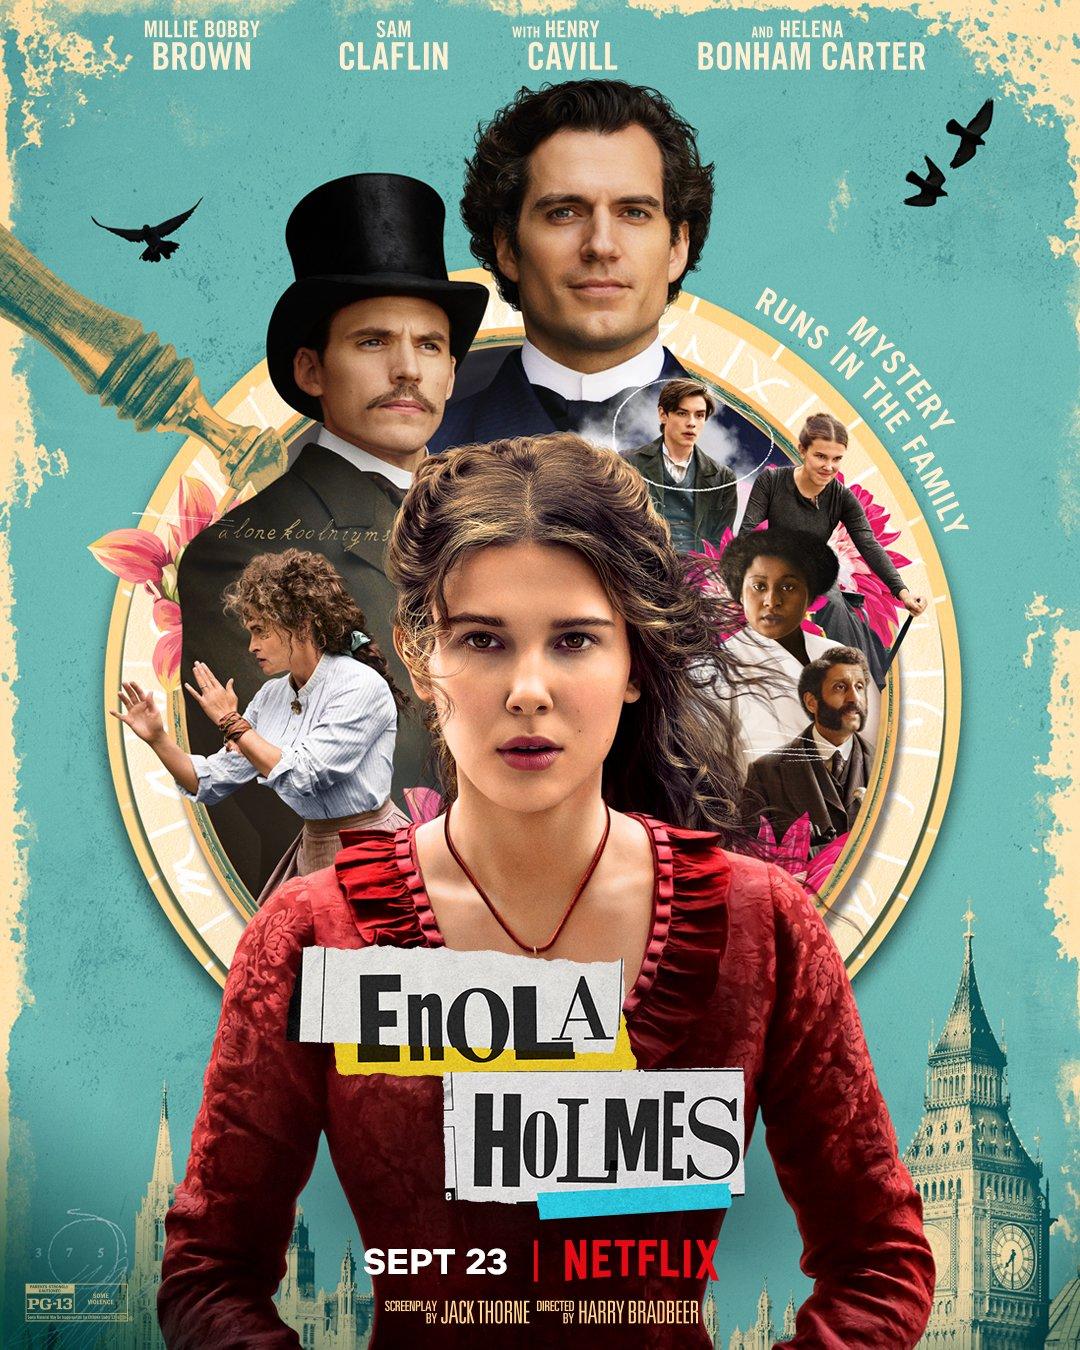 Enola Holmes : Millie Bobby Brown en petite sœur de Sherlock (bande-annonce)